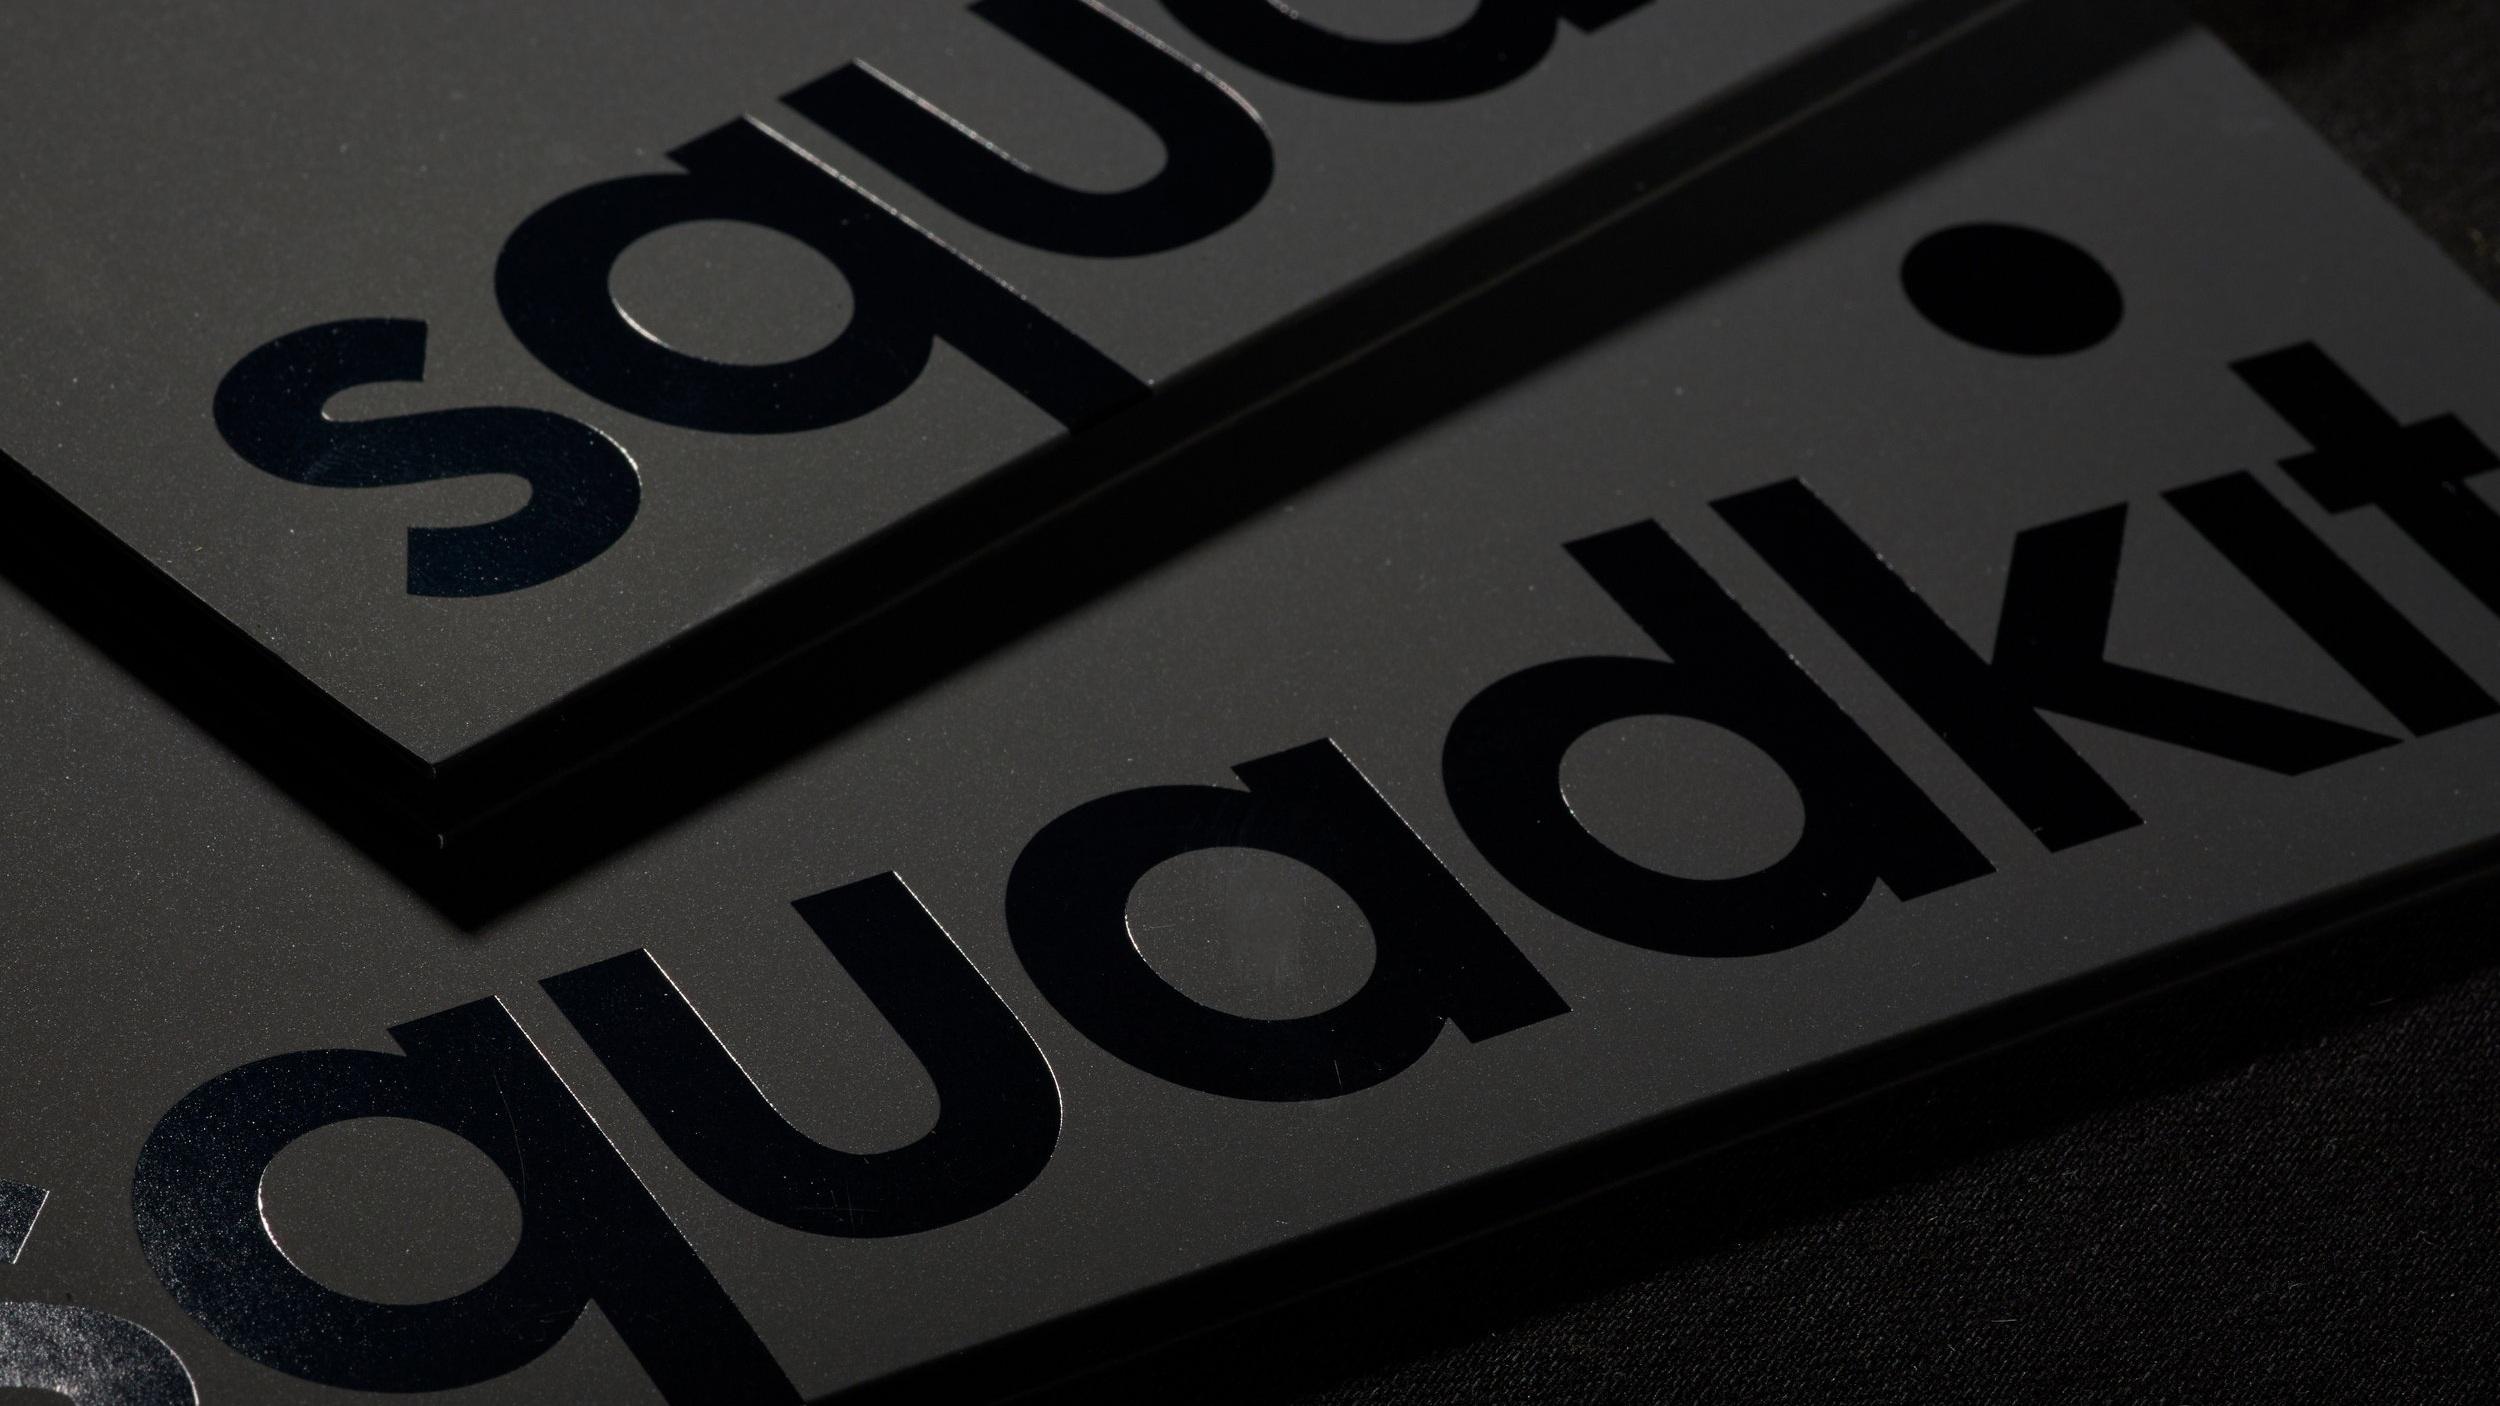 Squadkit_CaseStudies_IMAGES_5.jpg